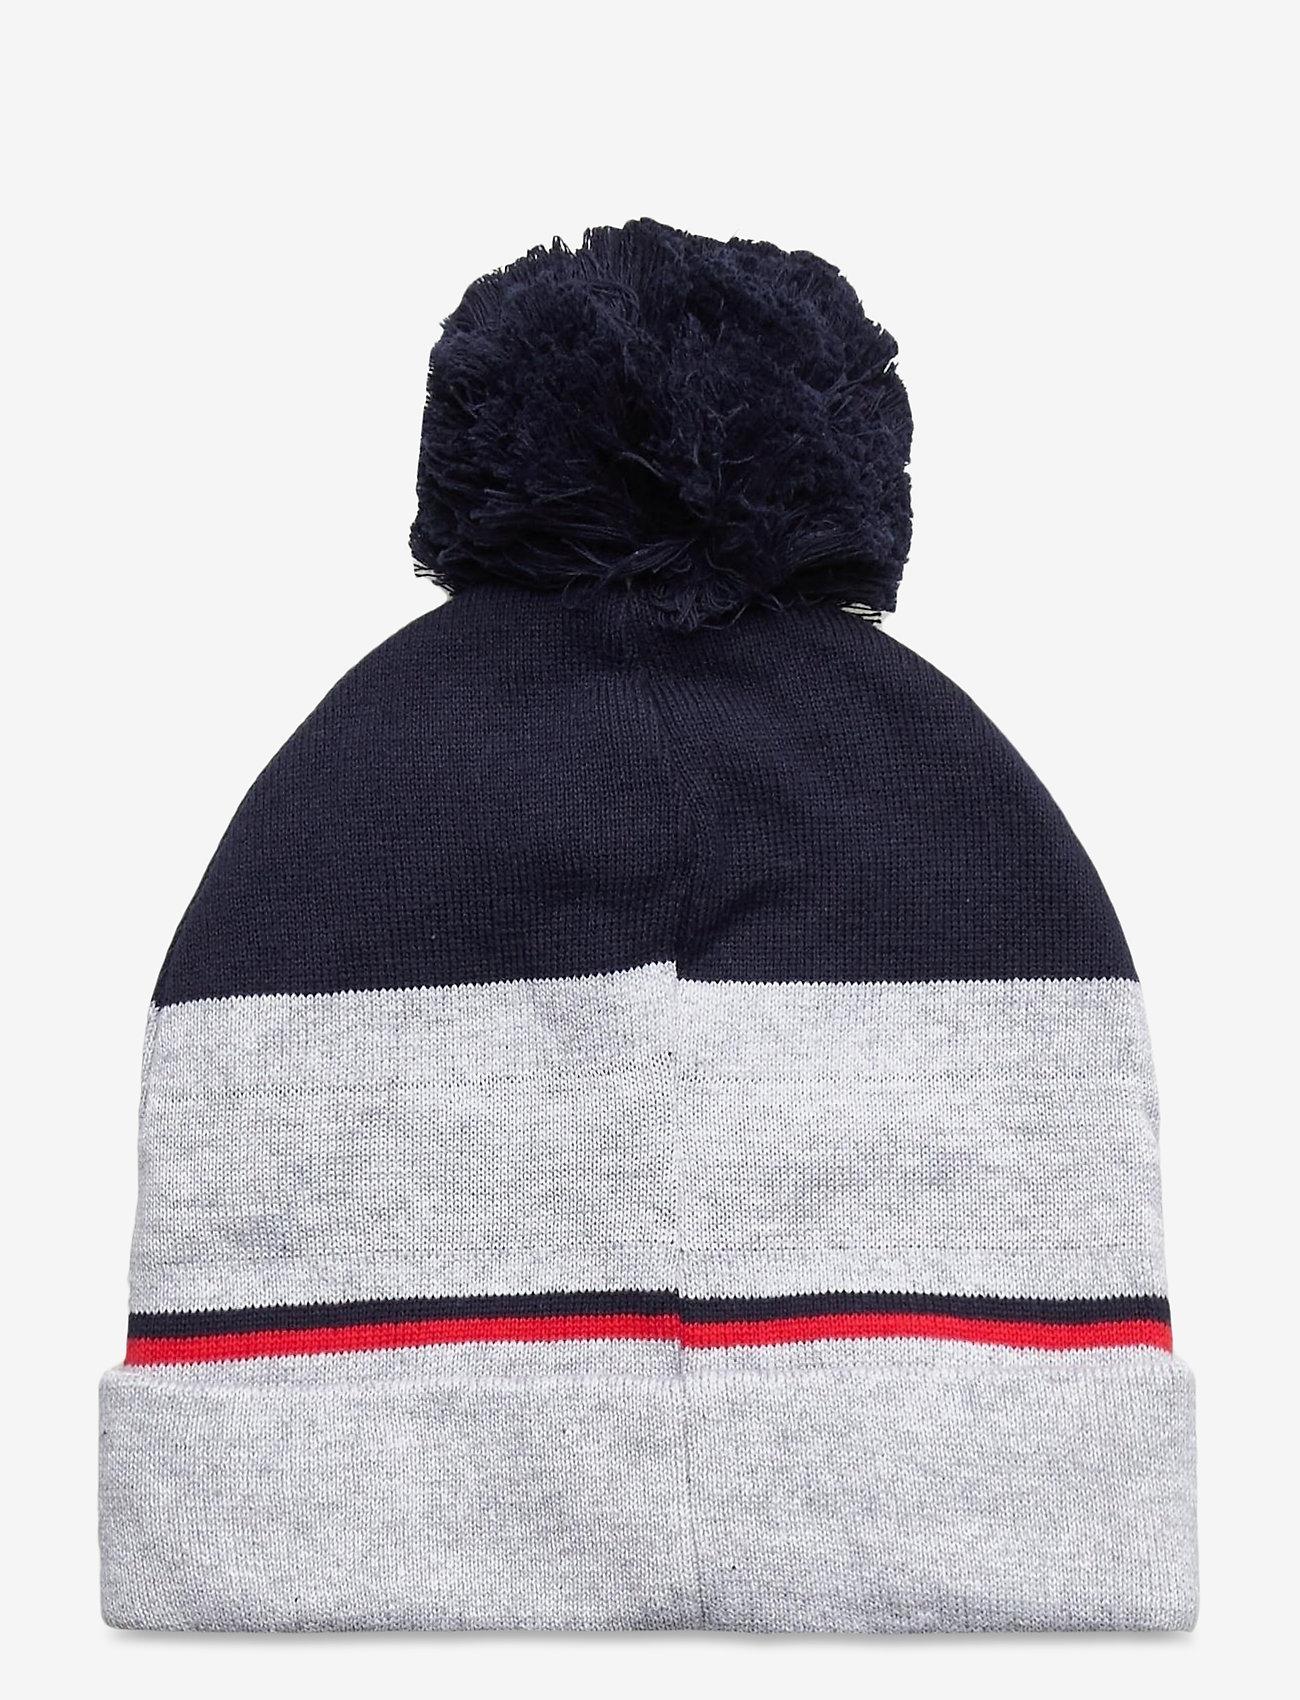 Kenzo - PULL ON HAT - huer - grey chine - 1